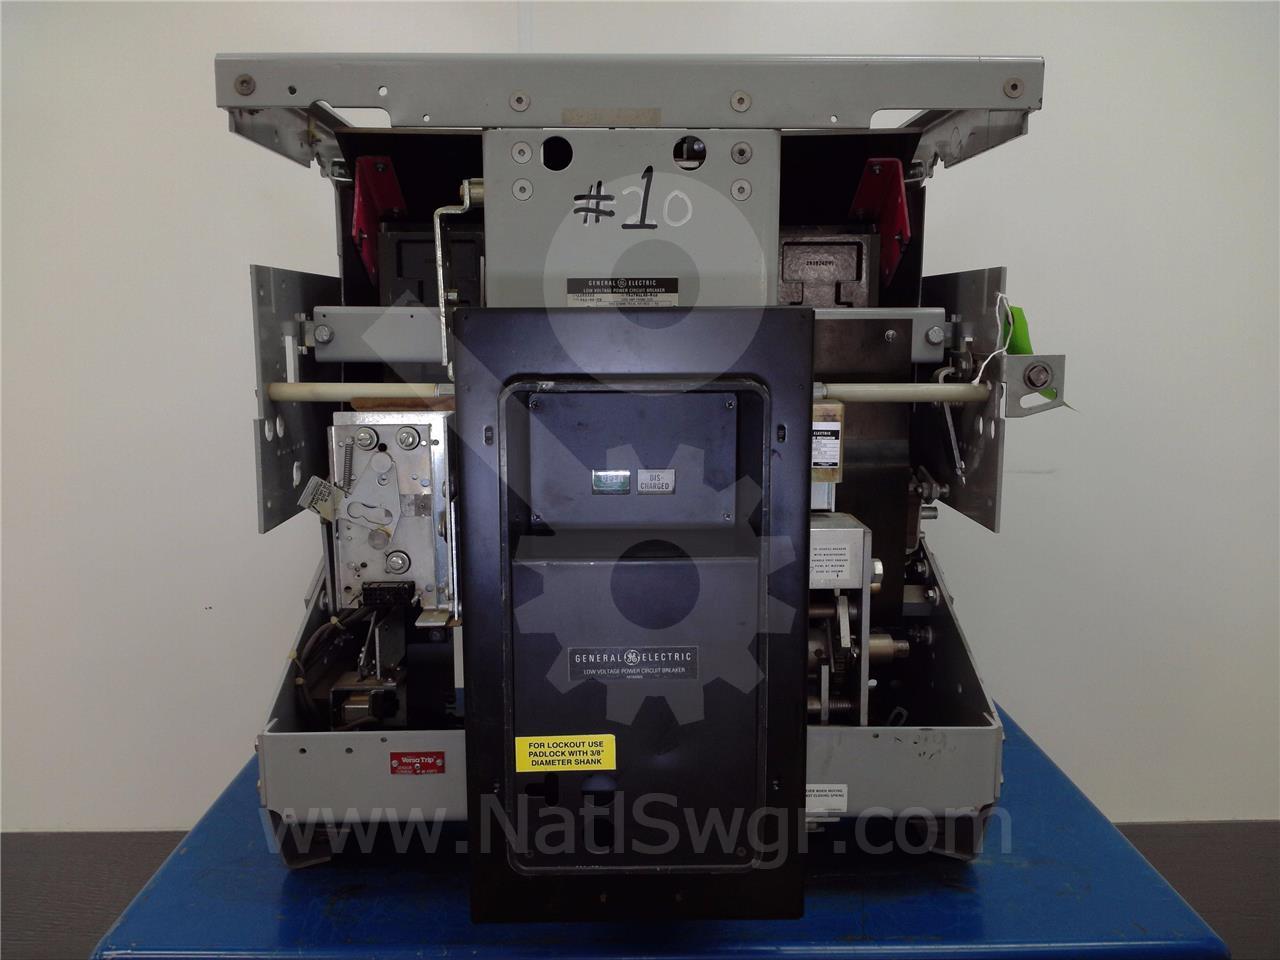 AKR-_D-75 AKR-6D-75 3200A GE / General Electric EO/DO 3200A CT